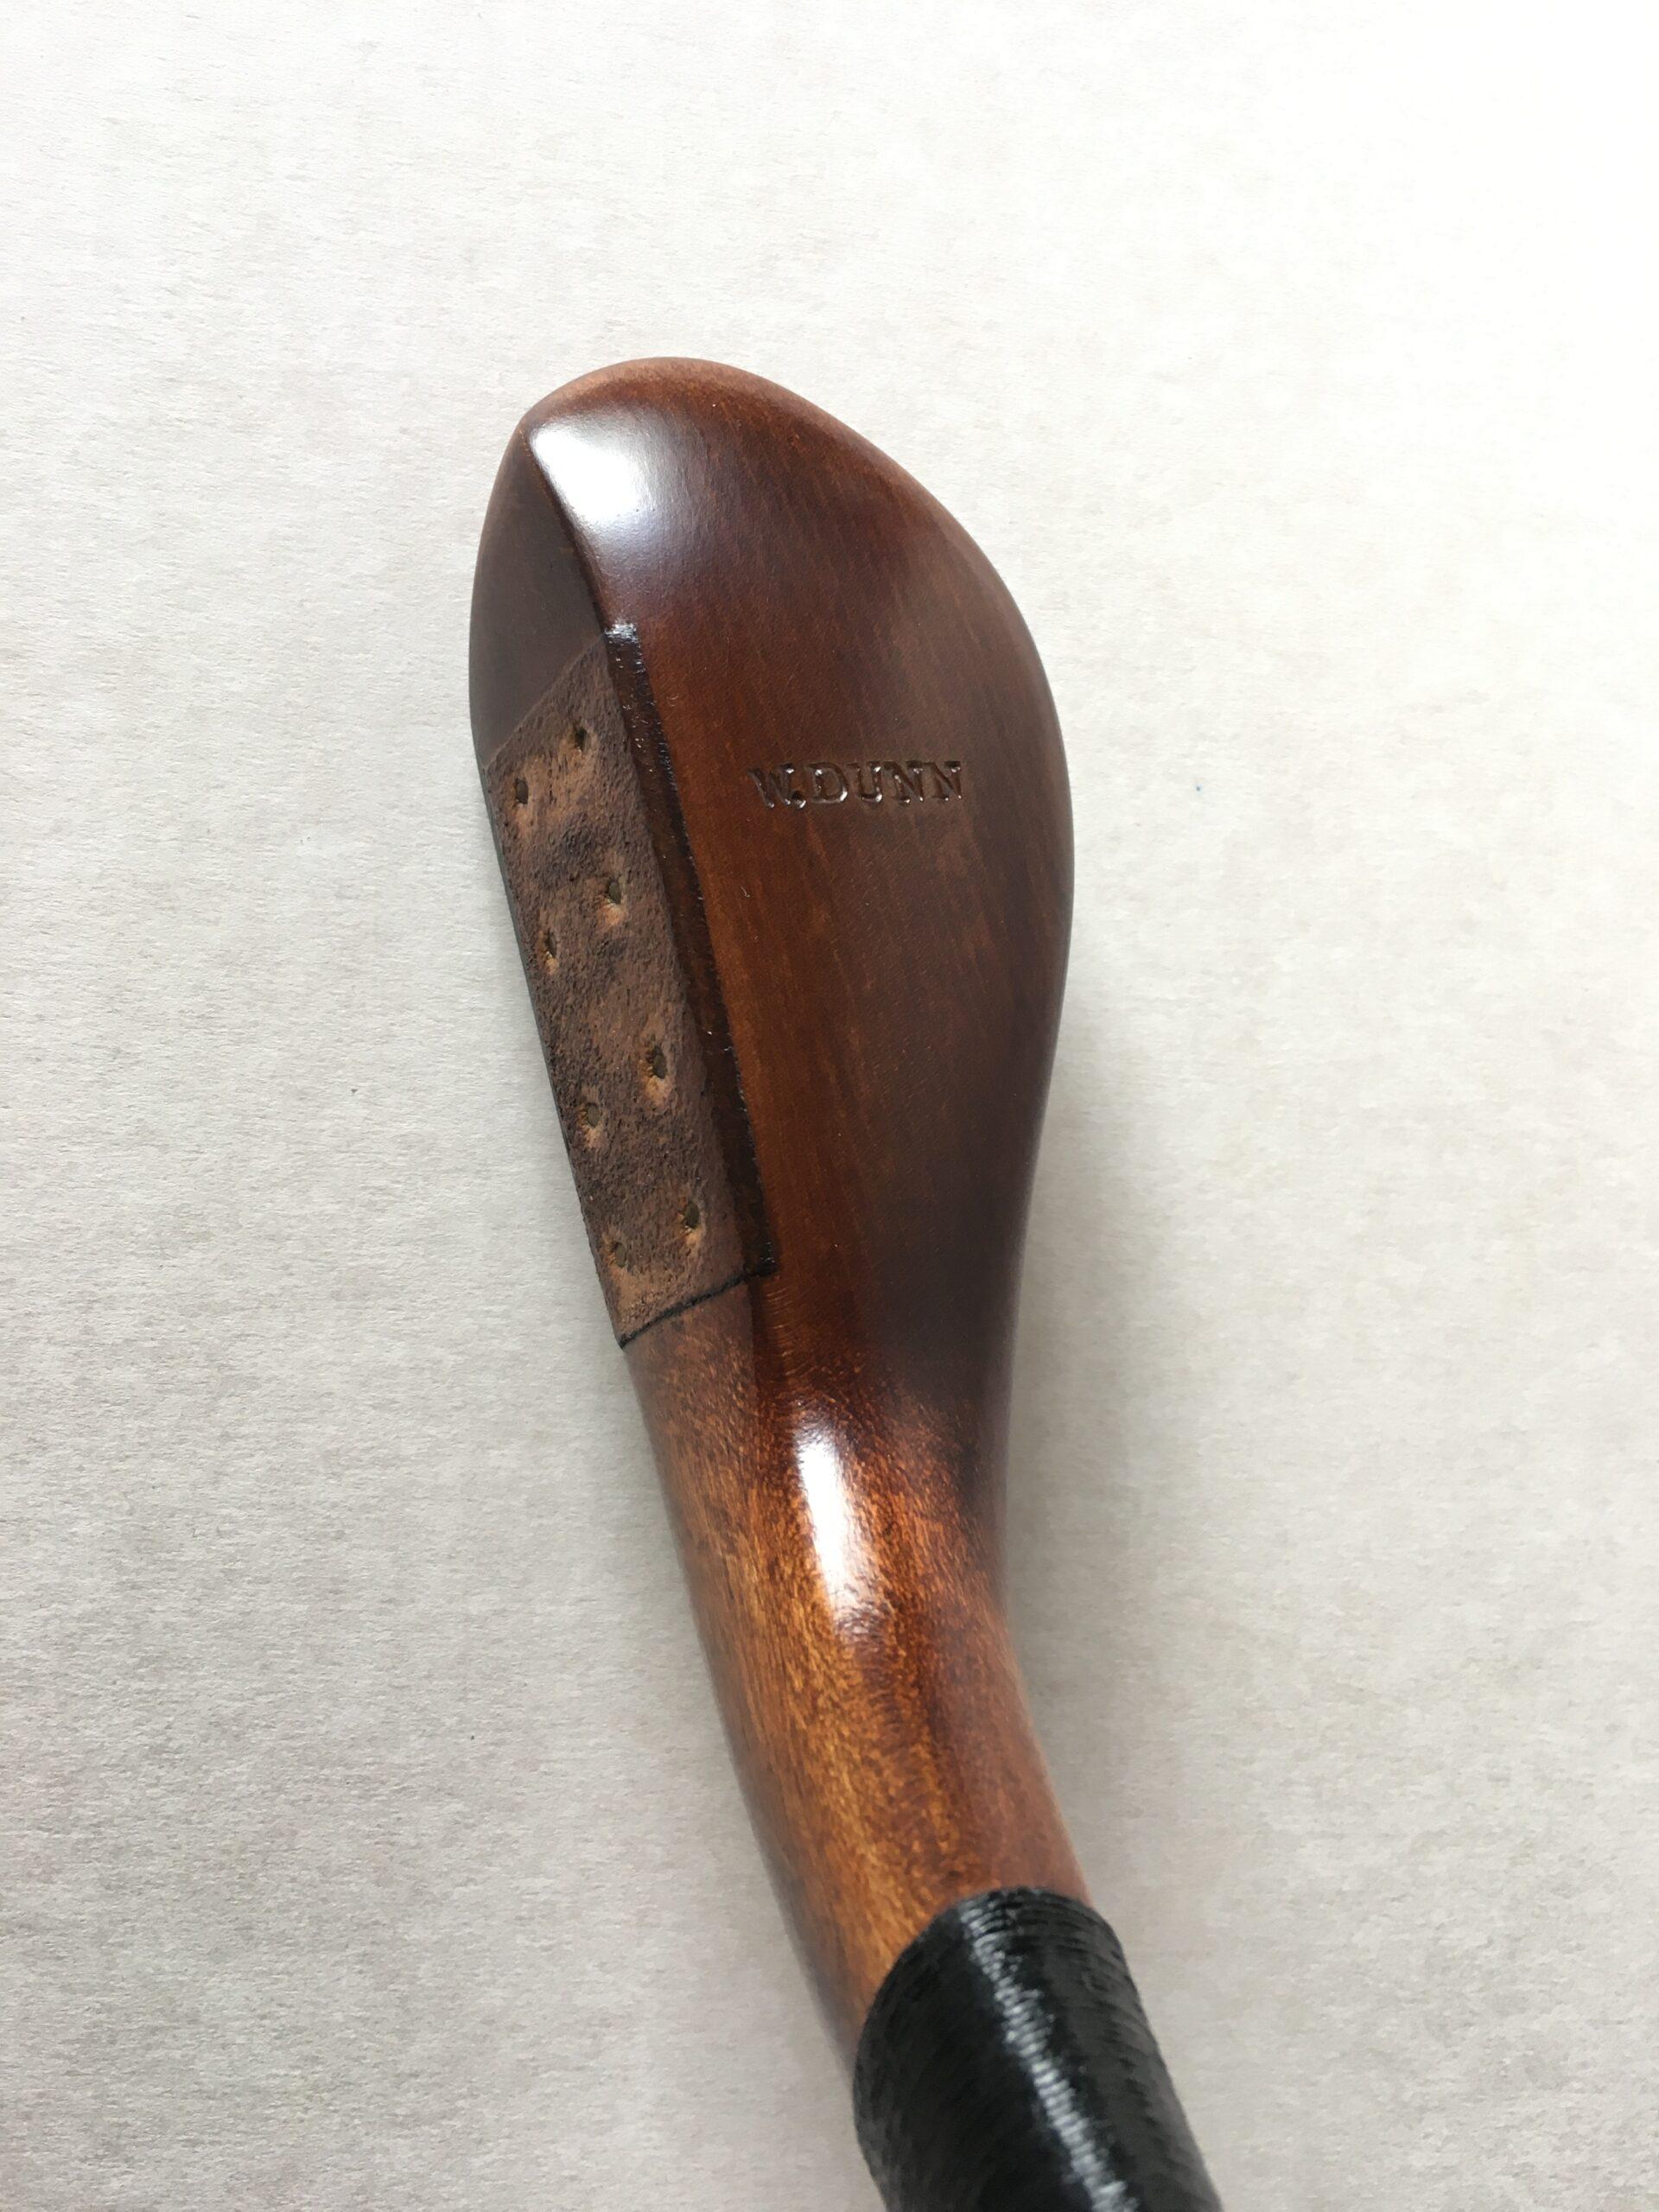 Willie Dunn Sr. Baffing spoon replica